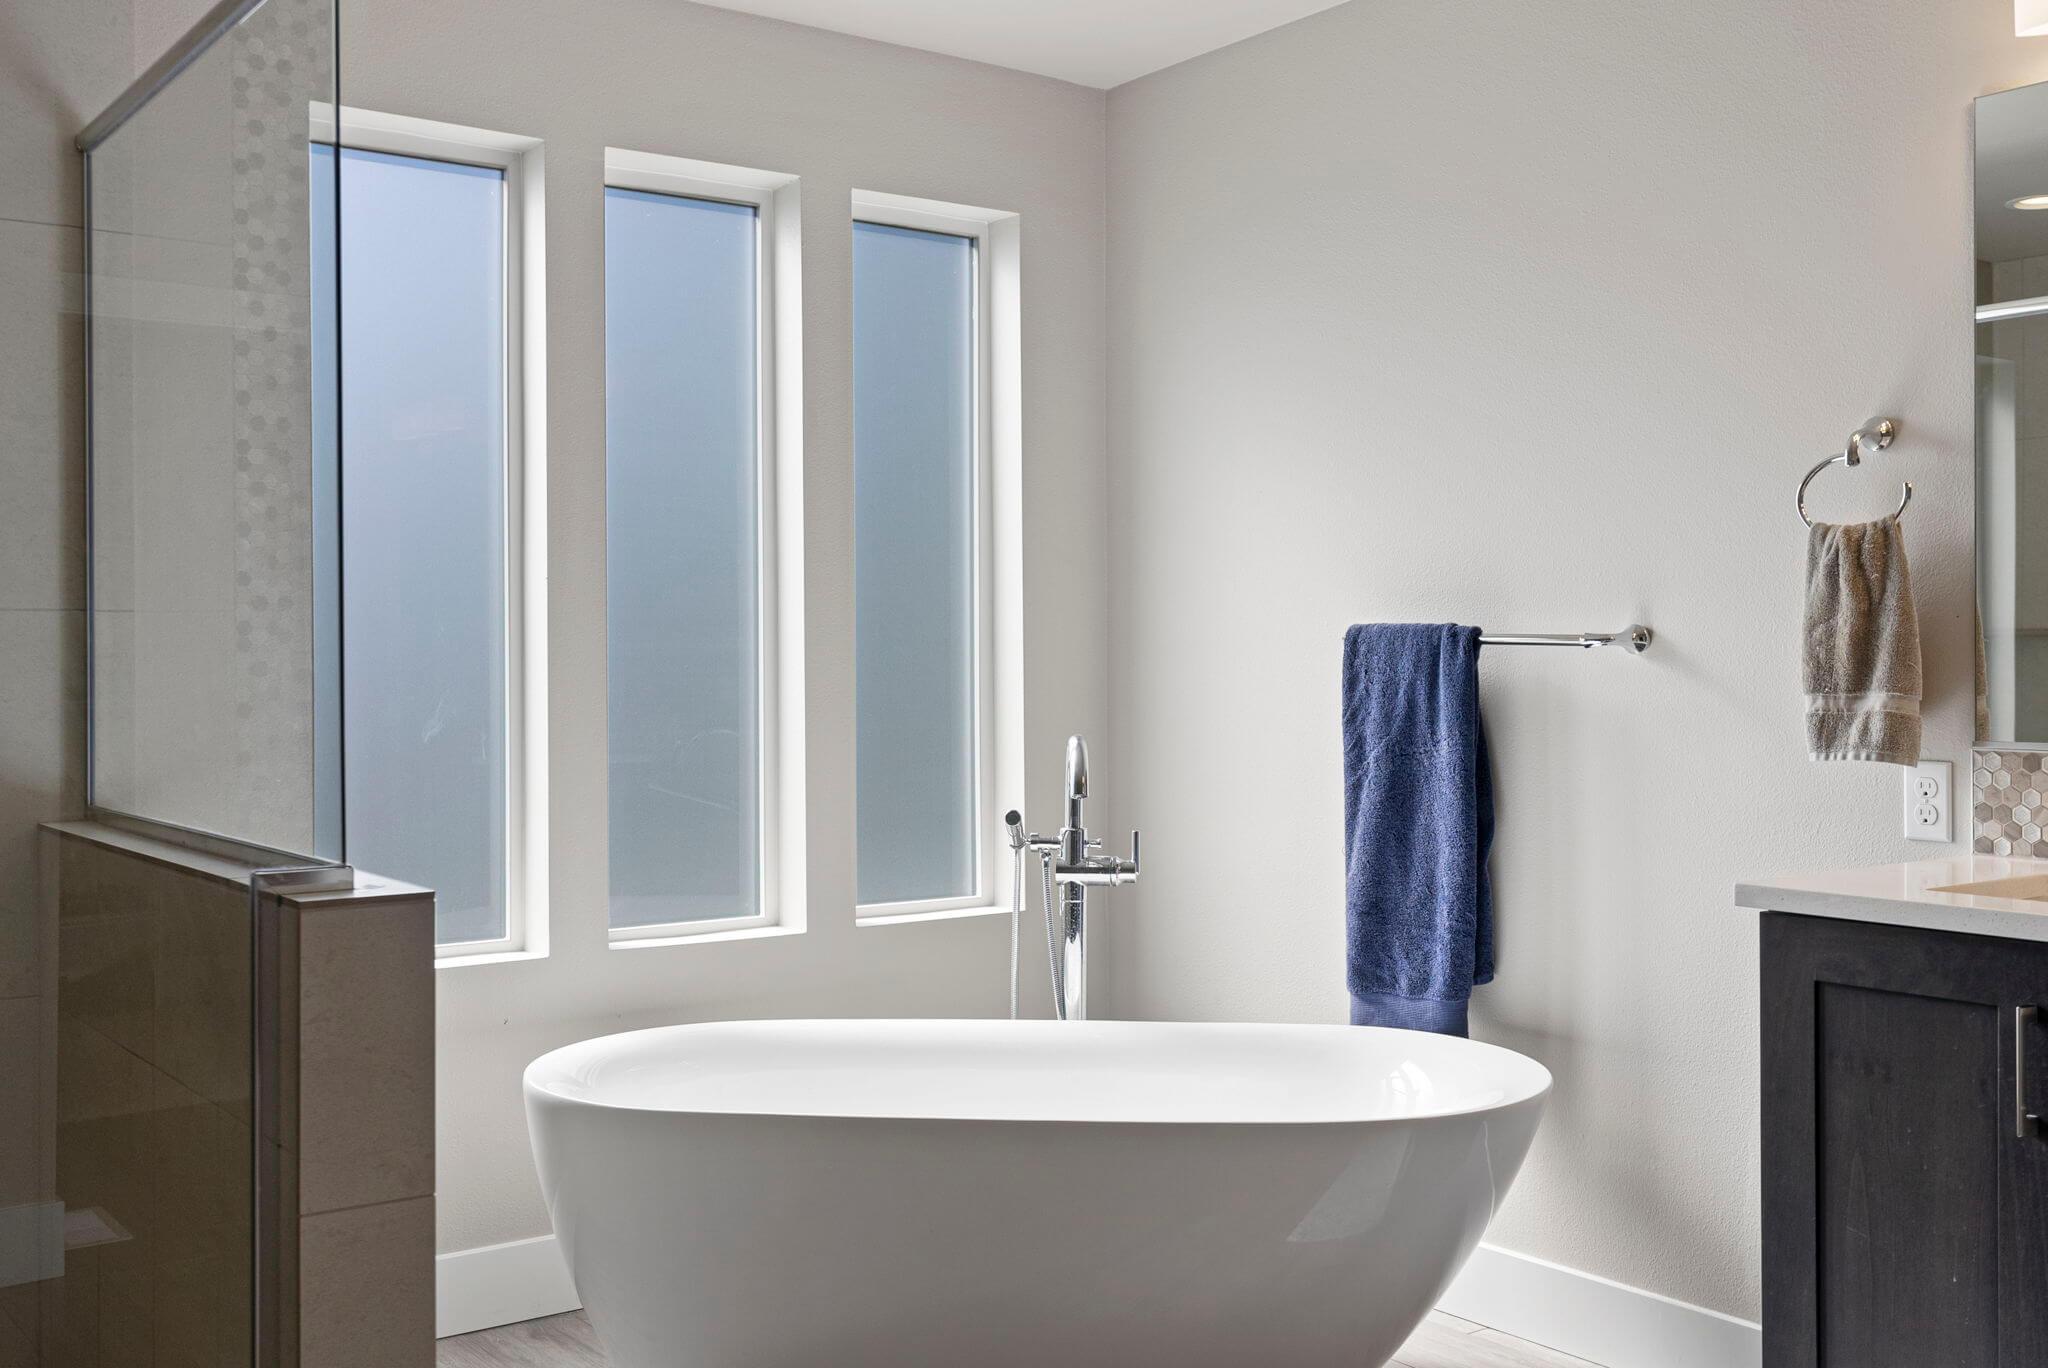 Spa-like soaking tub